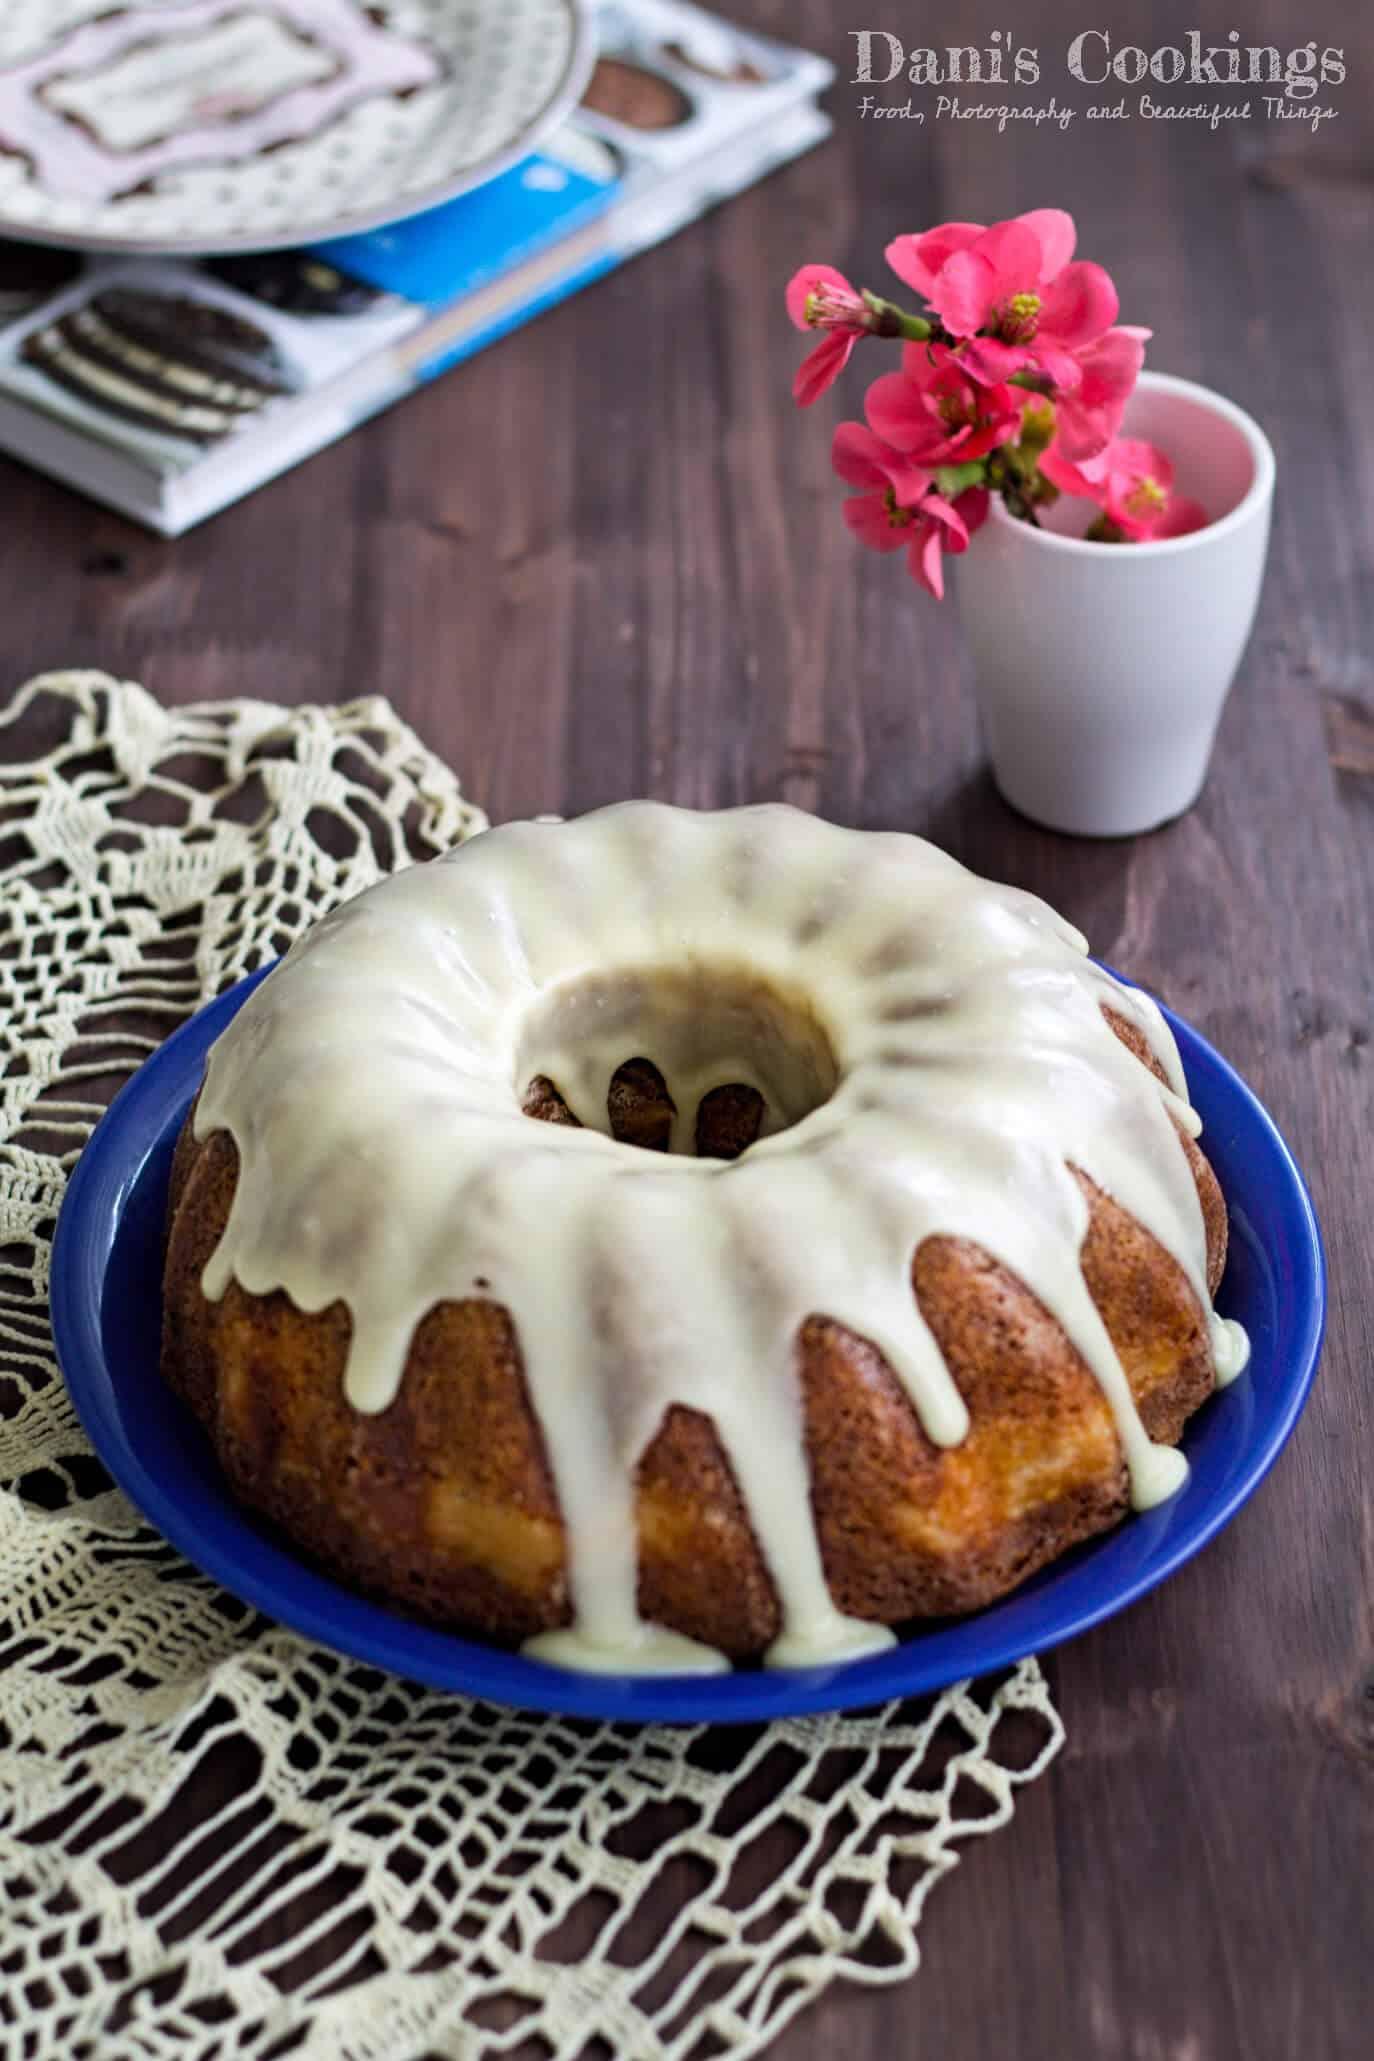 a bundt cake with white glaze on a plate